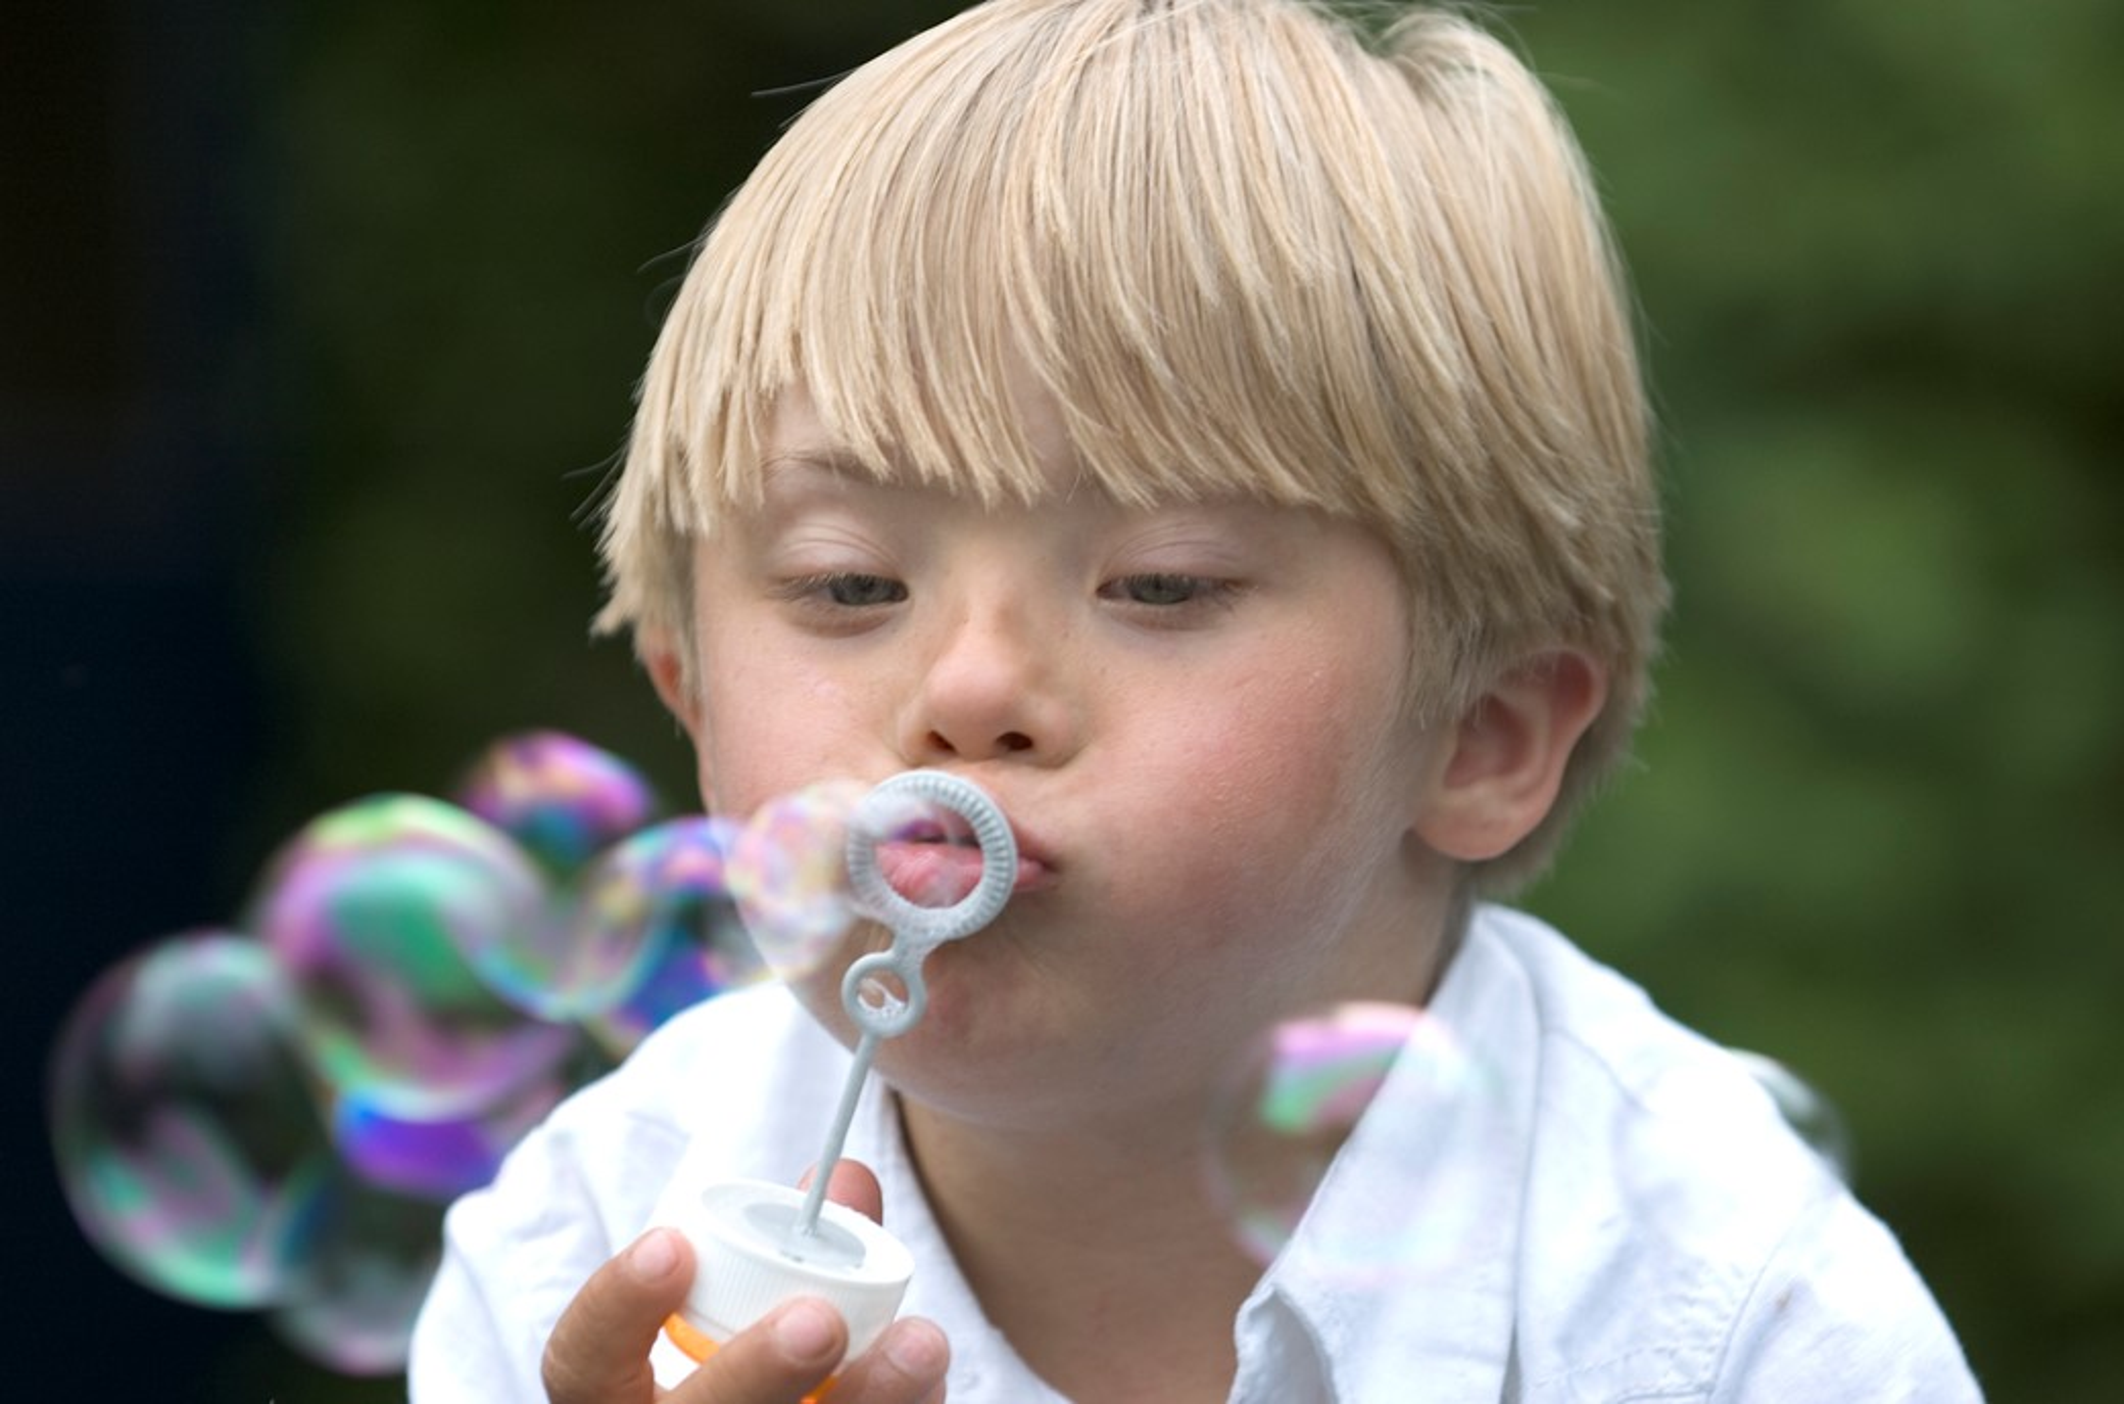 Menino soprando bolhas